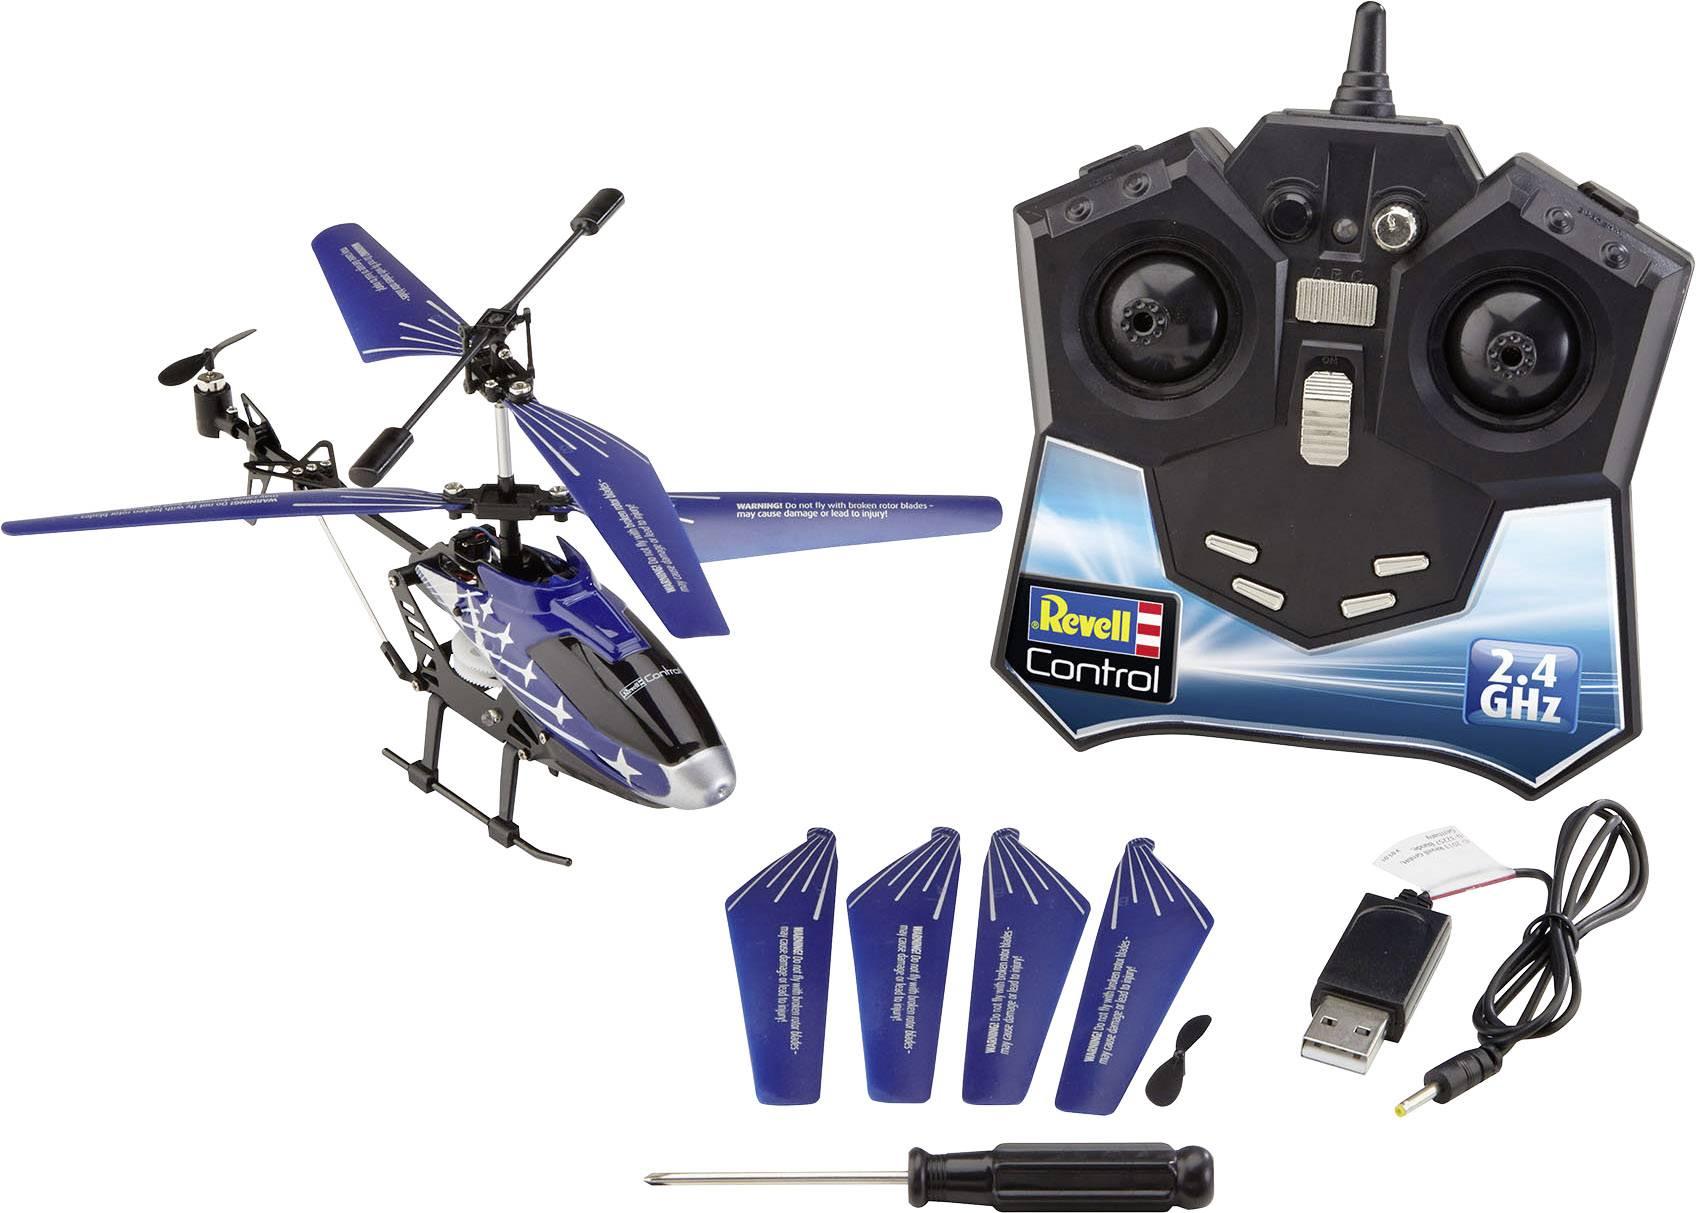 Revell Weihnachtskalender.Adventskalender Revell Control Helikopter Bouwpakket Vanaf 8 Jaar